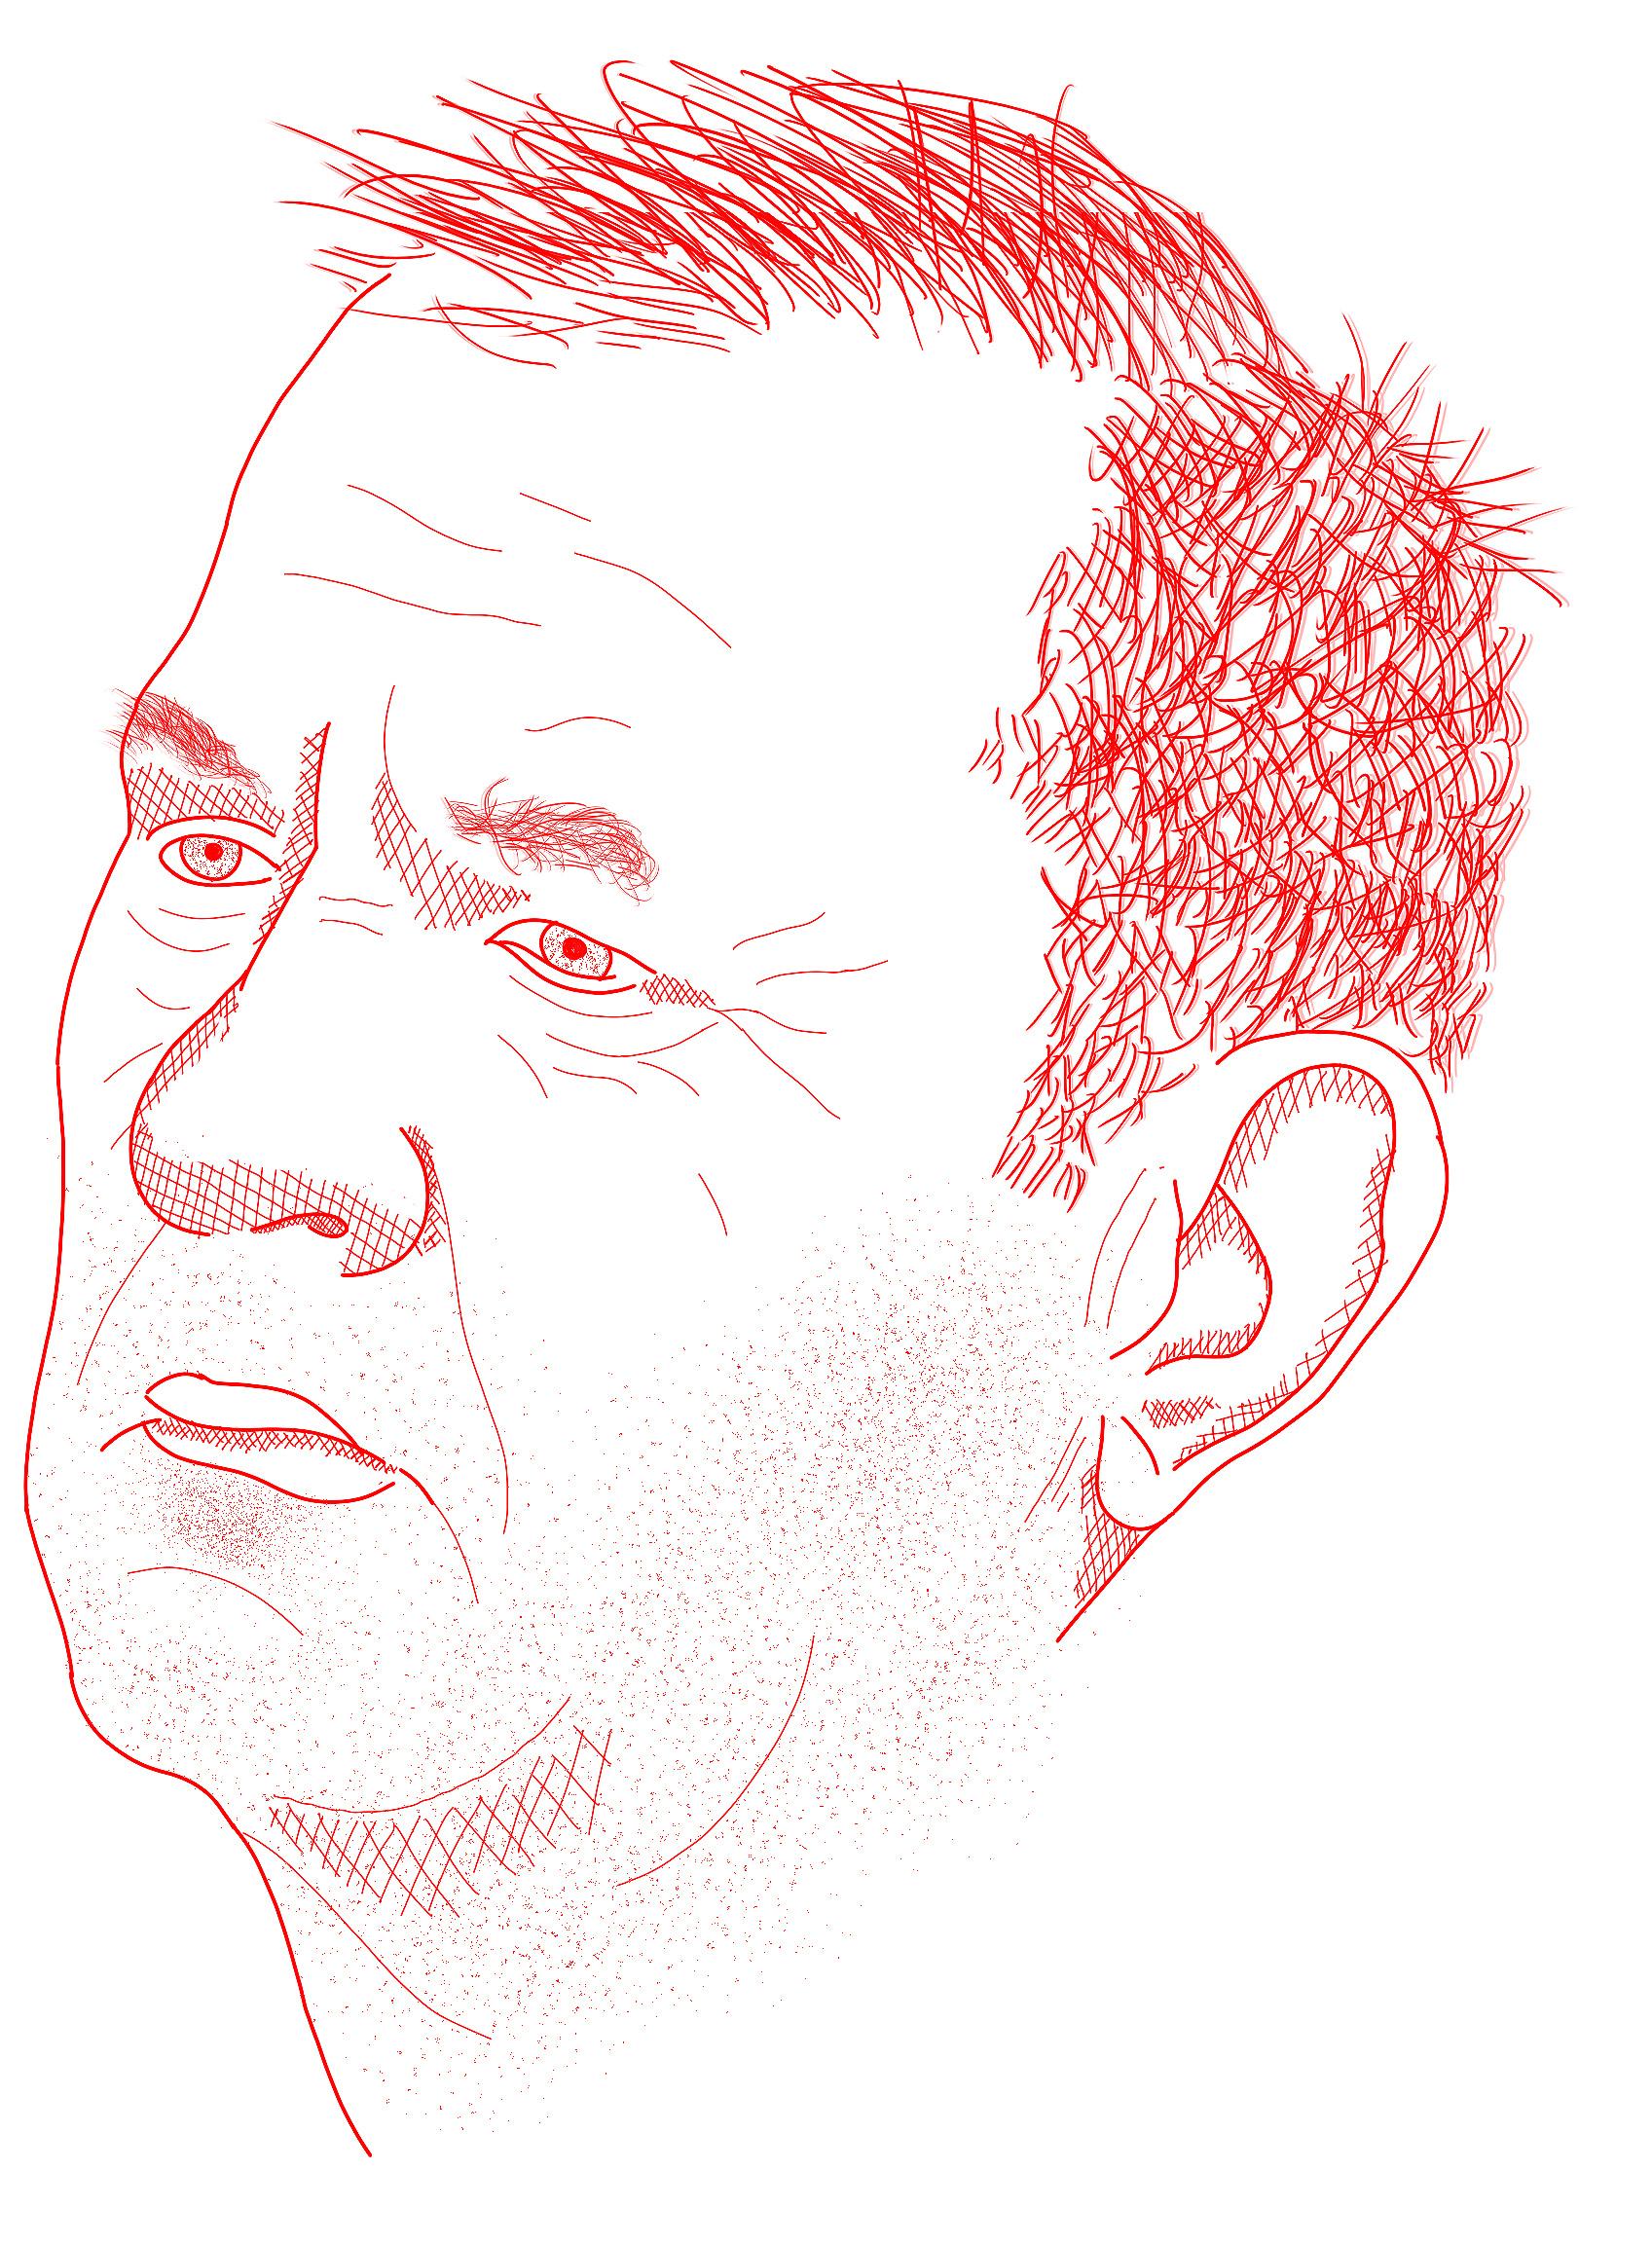 The likeness of Dmytro Rossoshansky.